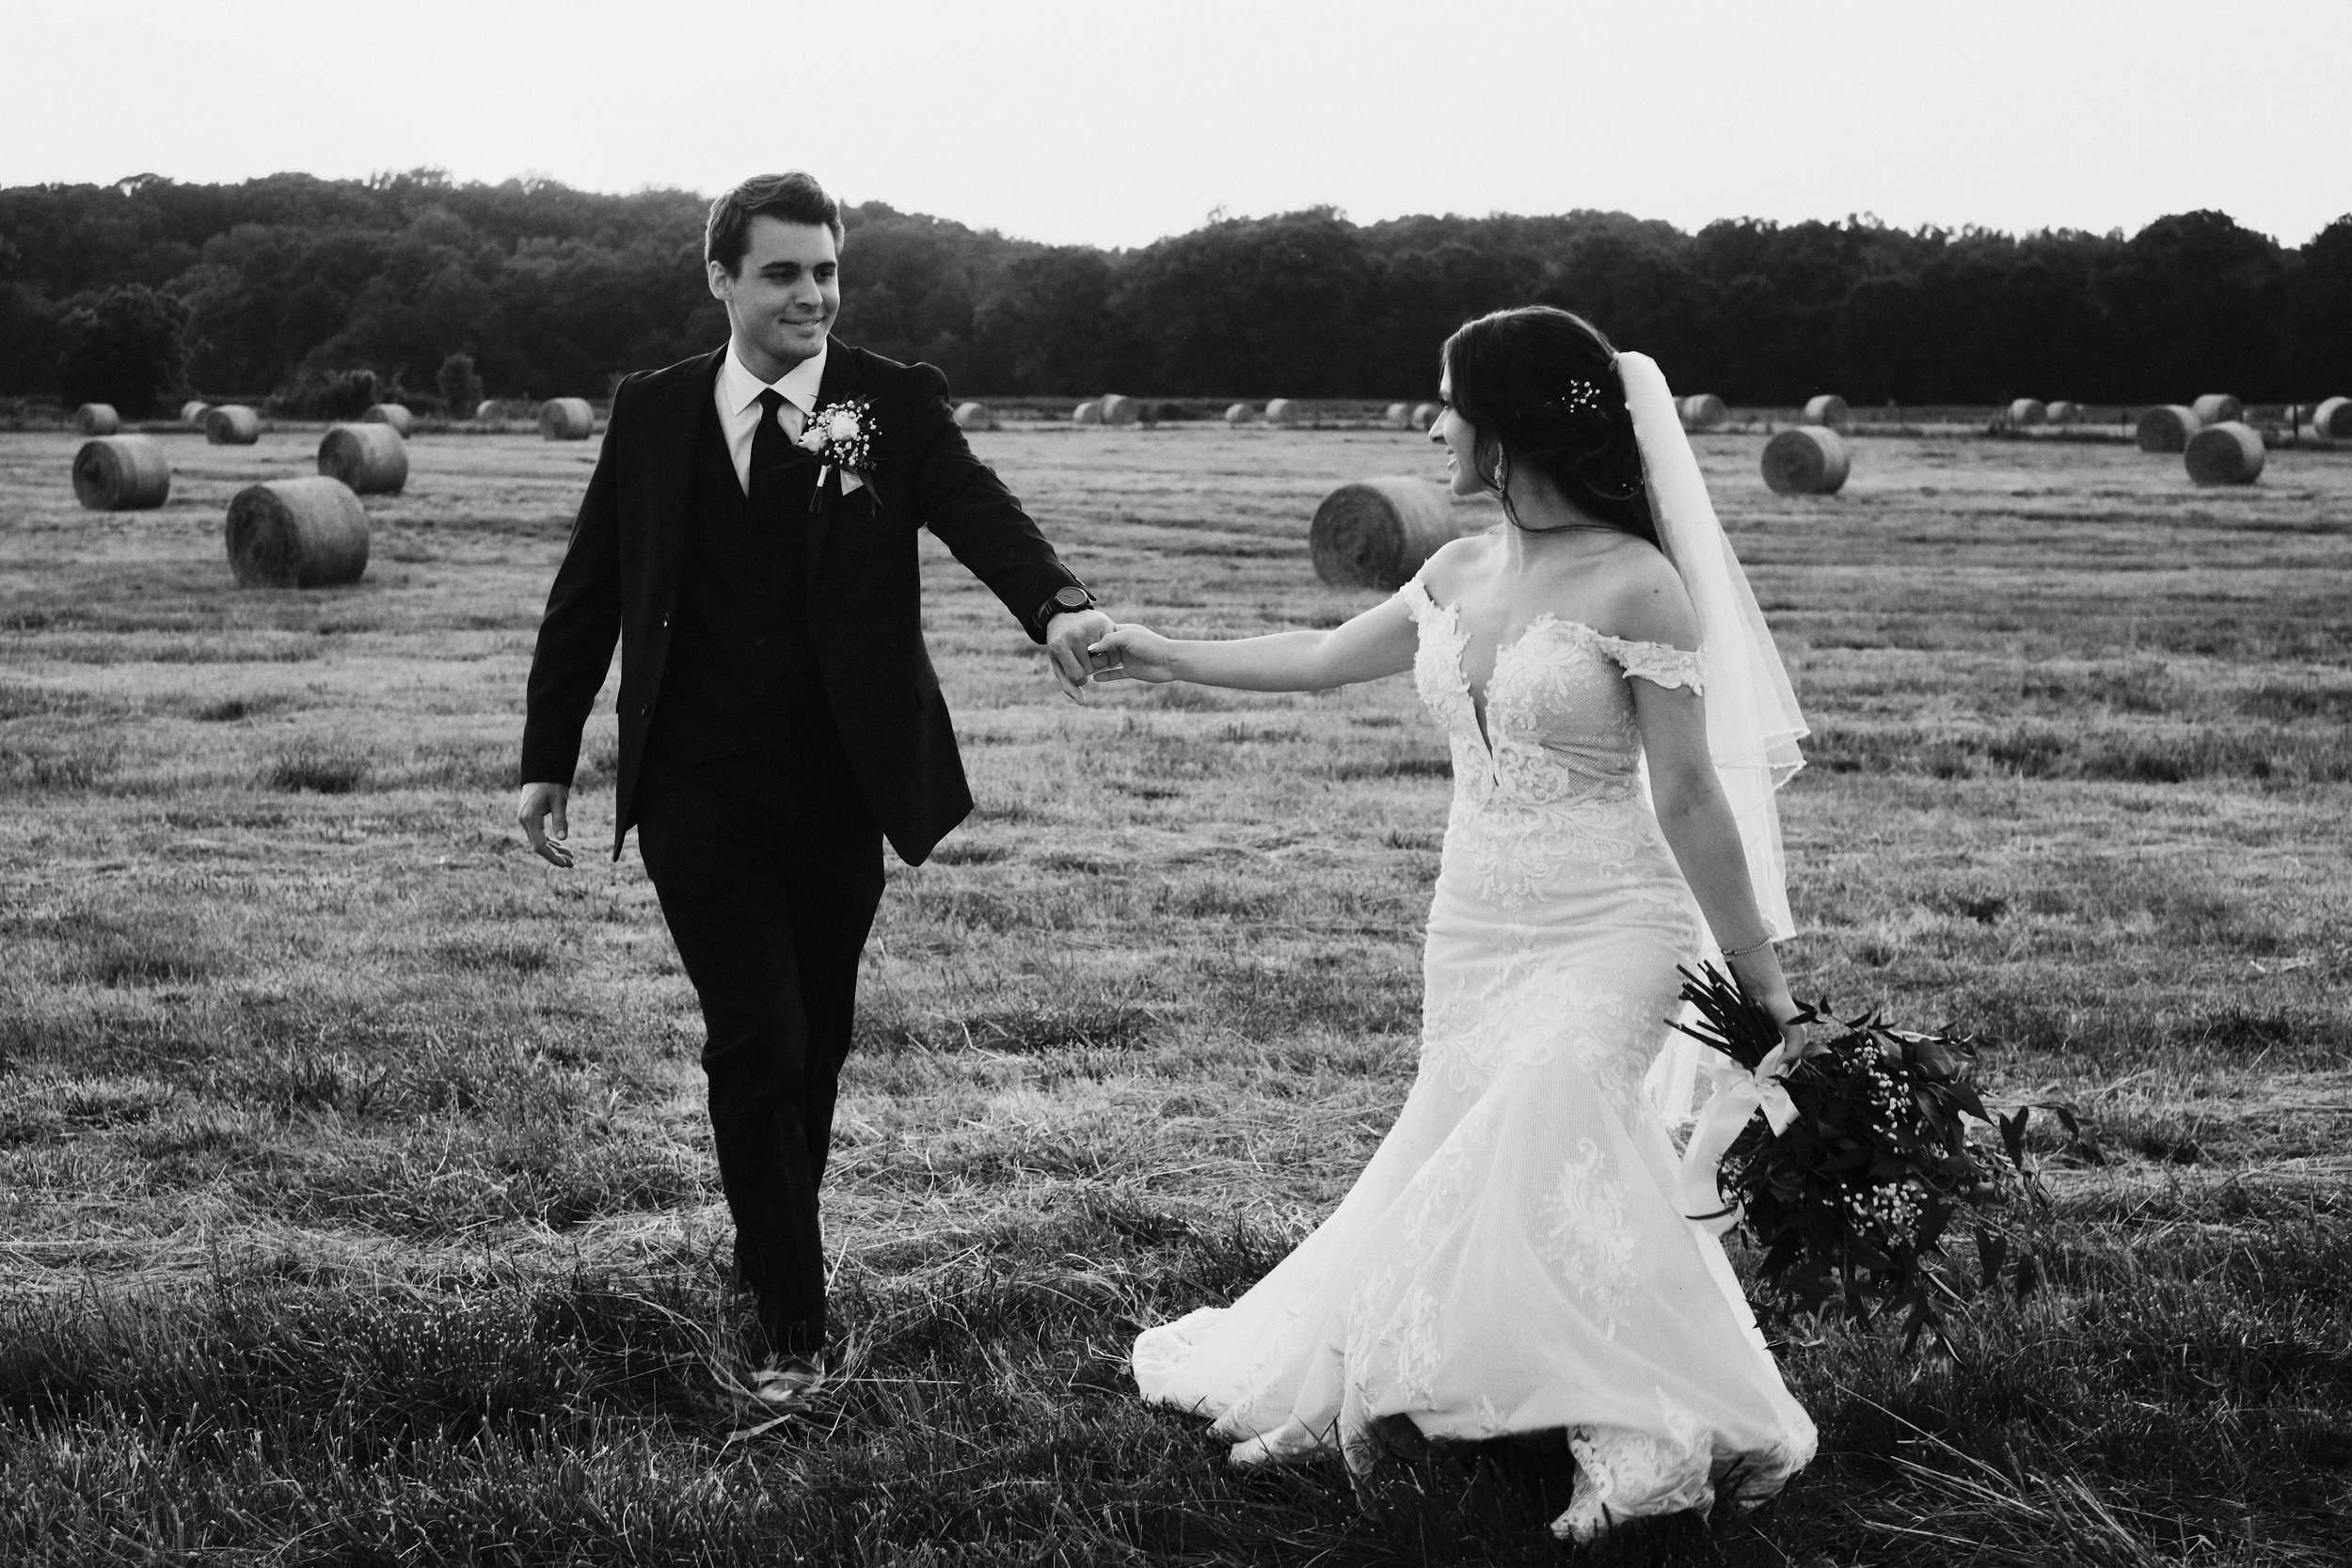 Candid portrait walking through field